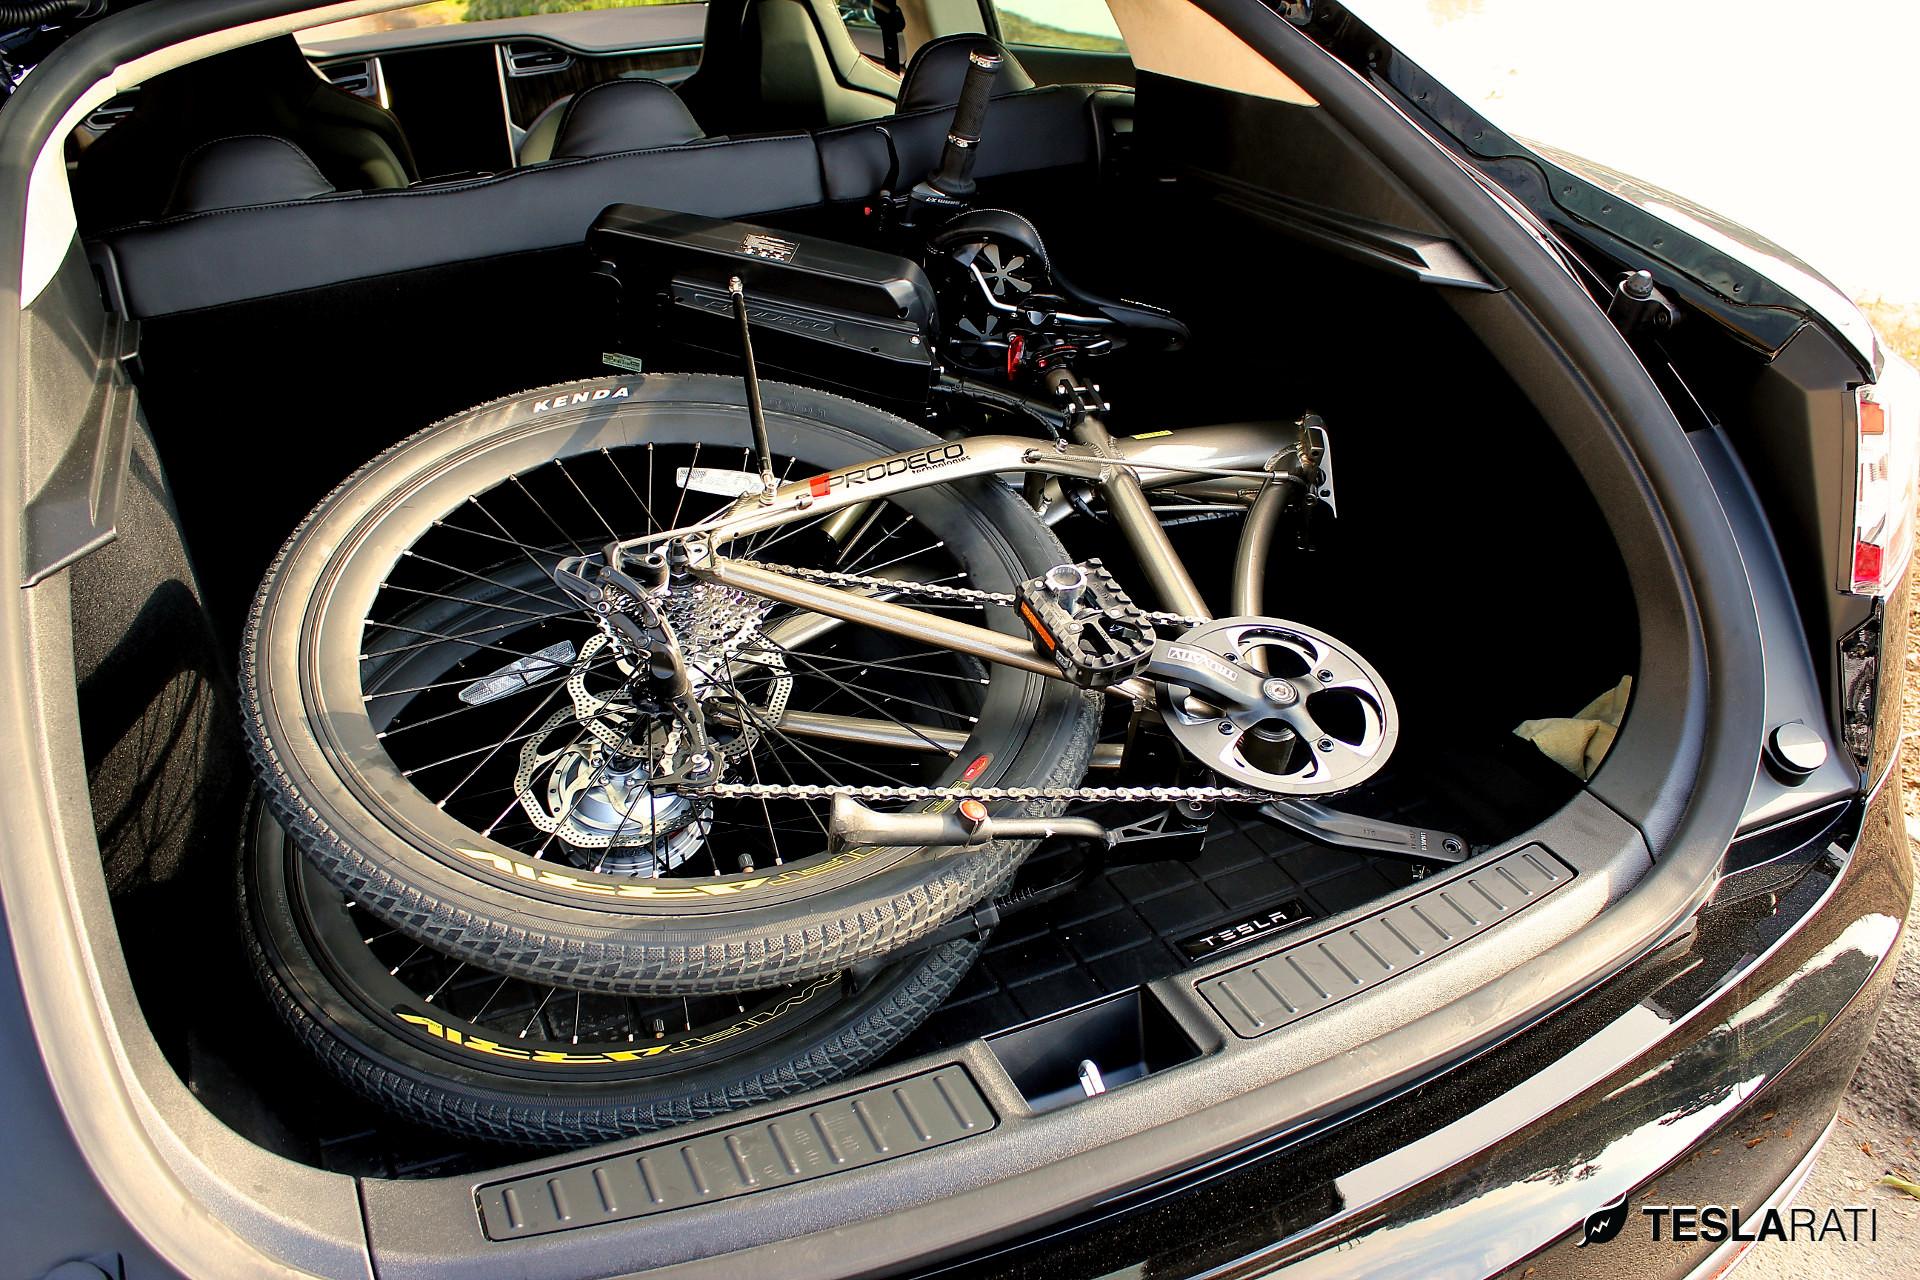 Tesla-Folding-Electric-Bike-Prodeco-22